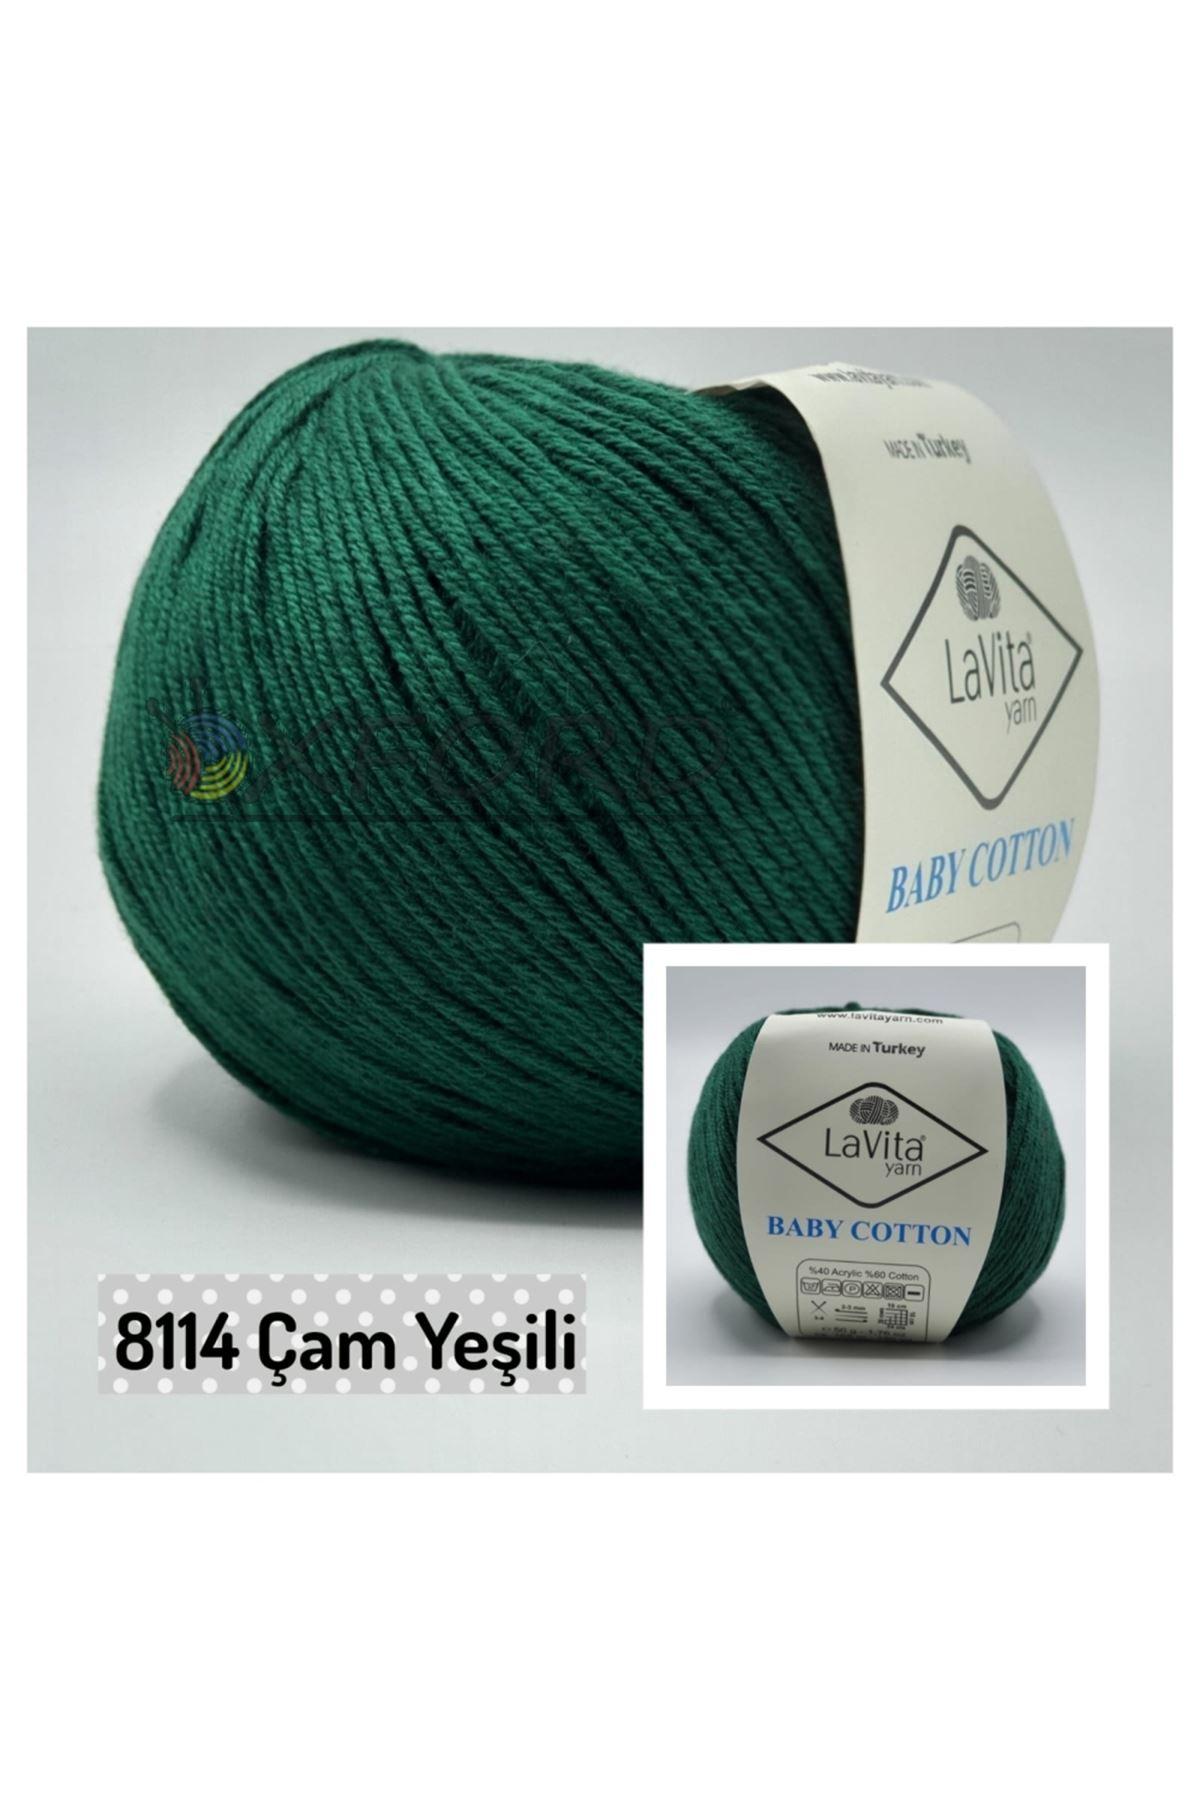 Lavita Baby Cotton 8114 Çam Yeşili